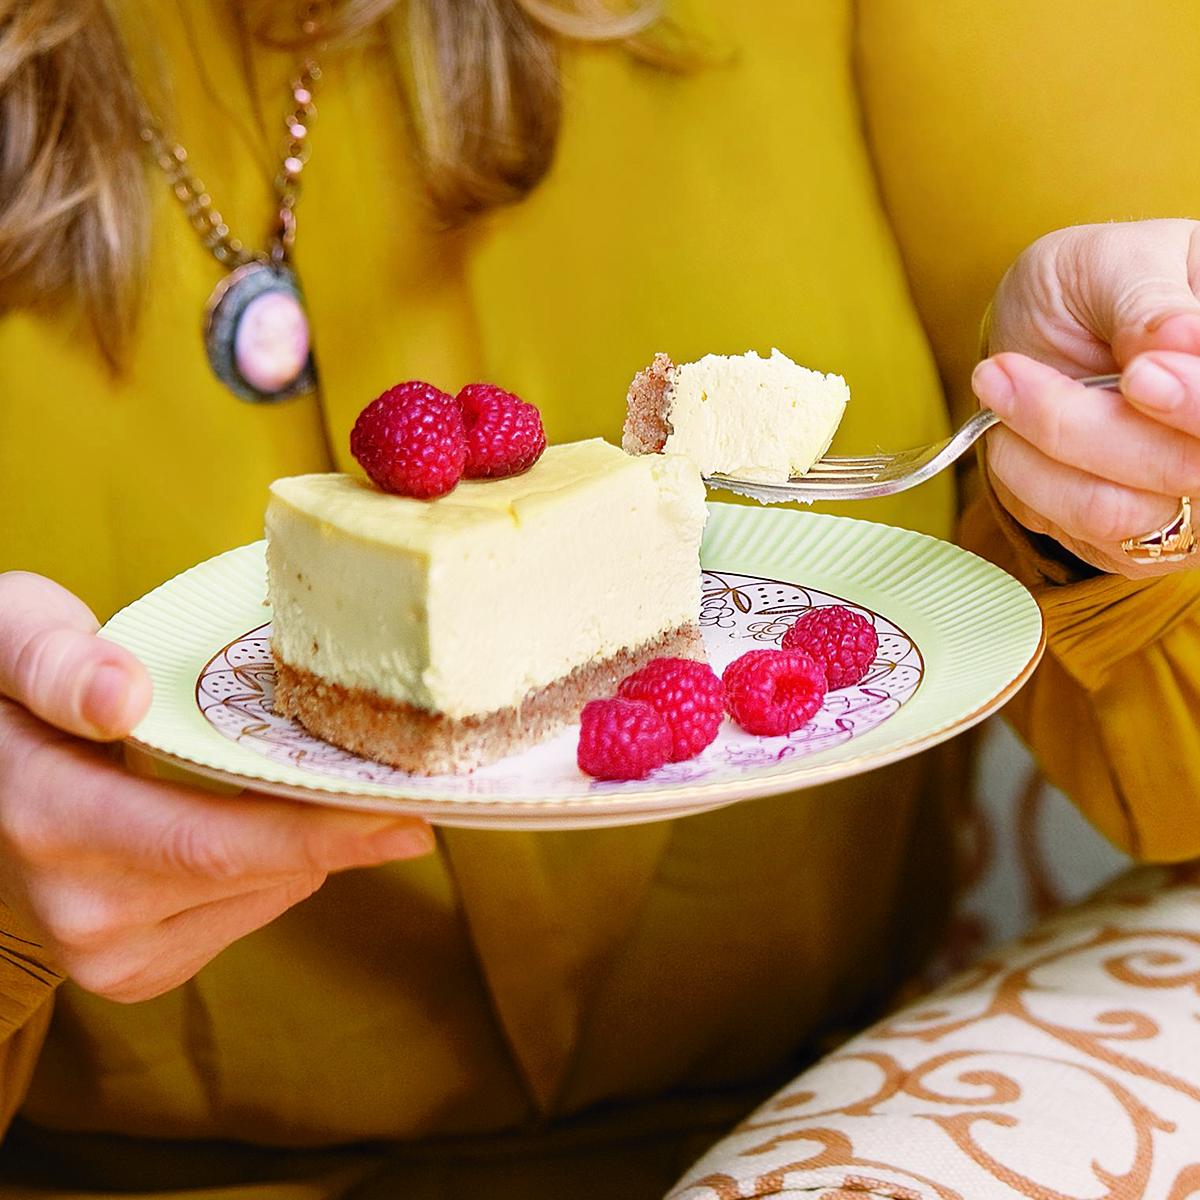 creaming lemon cheesecake with raspberries